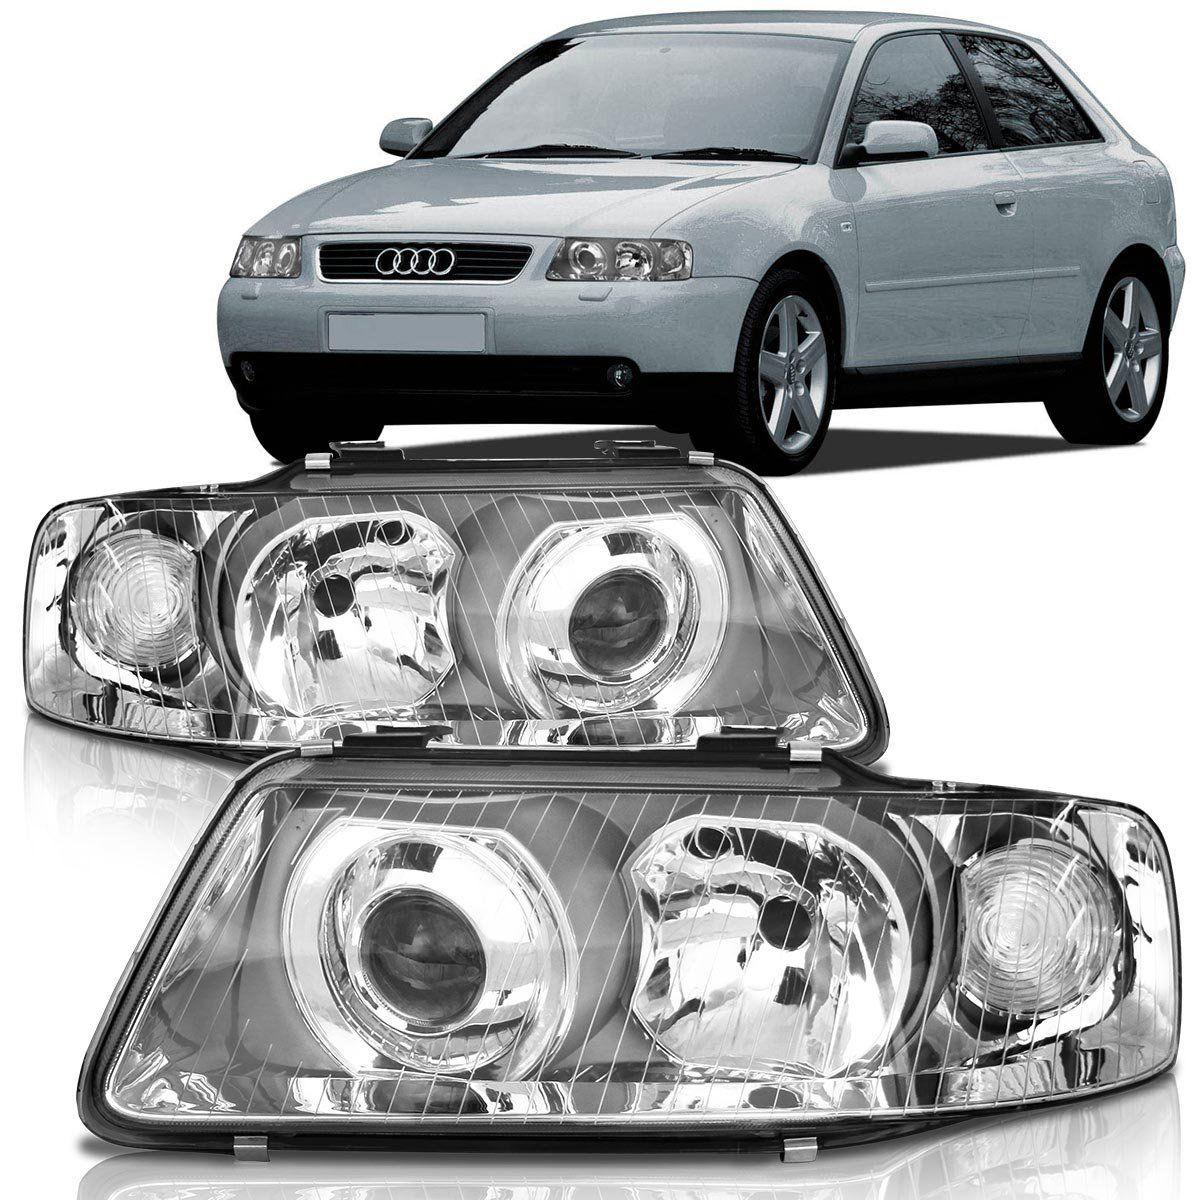 Farol Audi A3 2001 2002 2003 2004 2005 2006 Foco Duplo Cromado